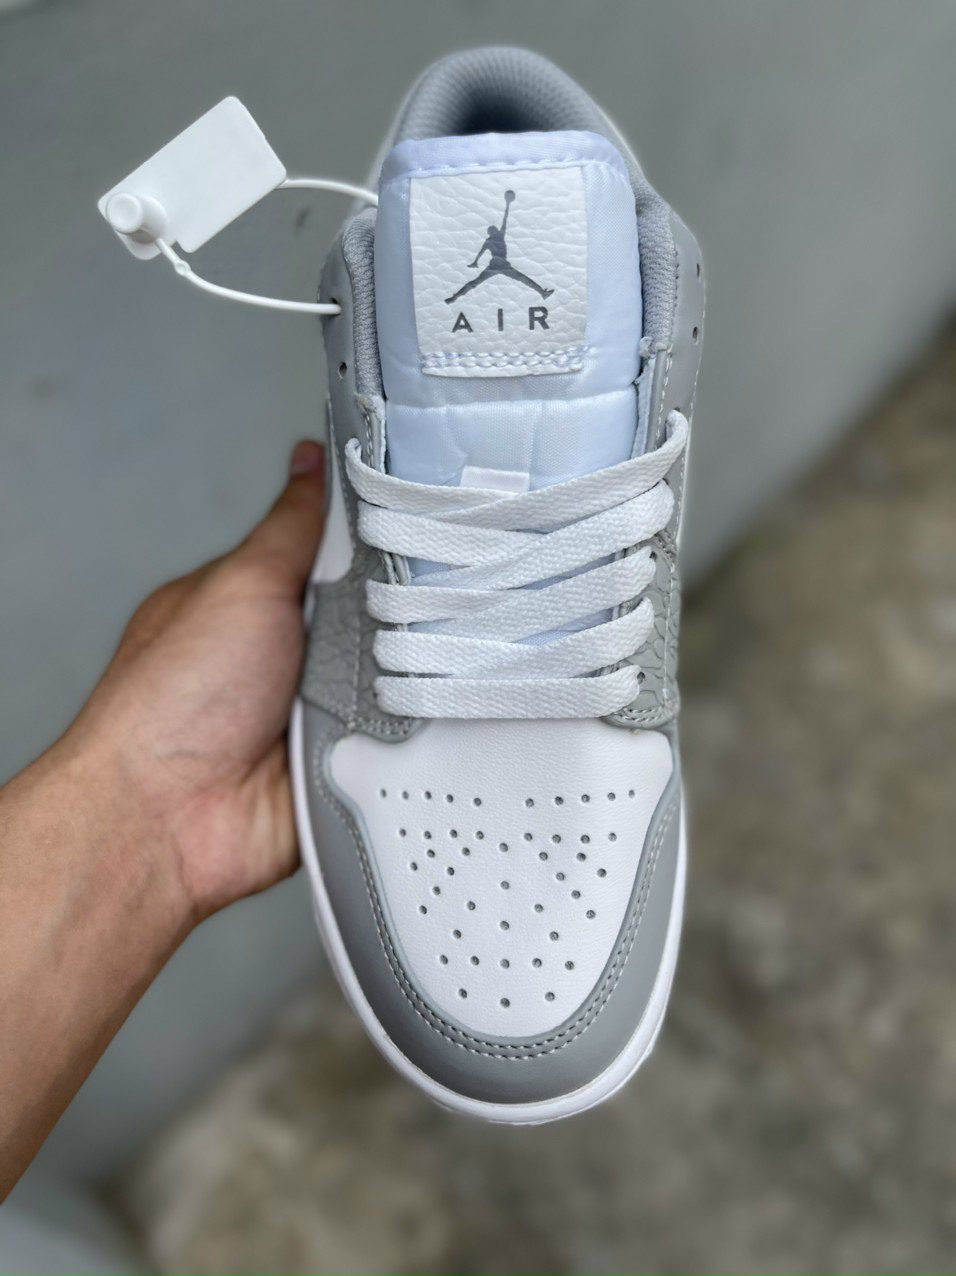 Air Jordan 1 Low Berlin Grey 4